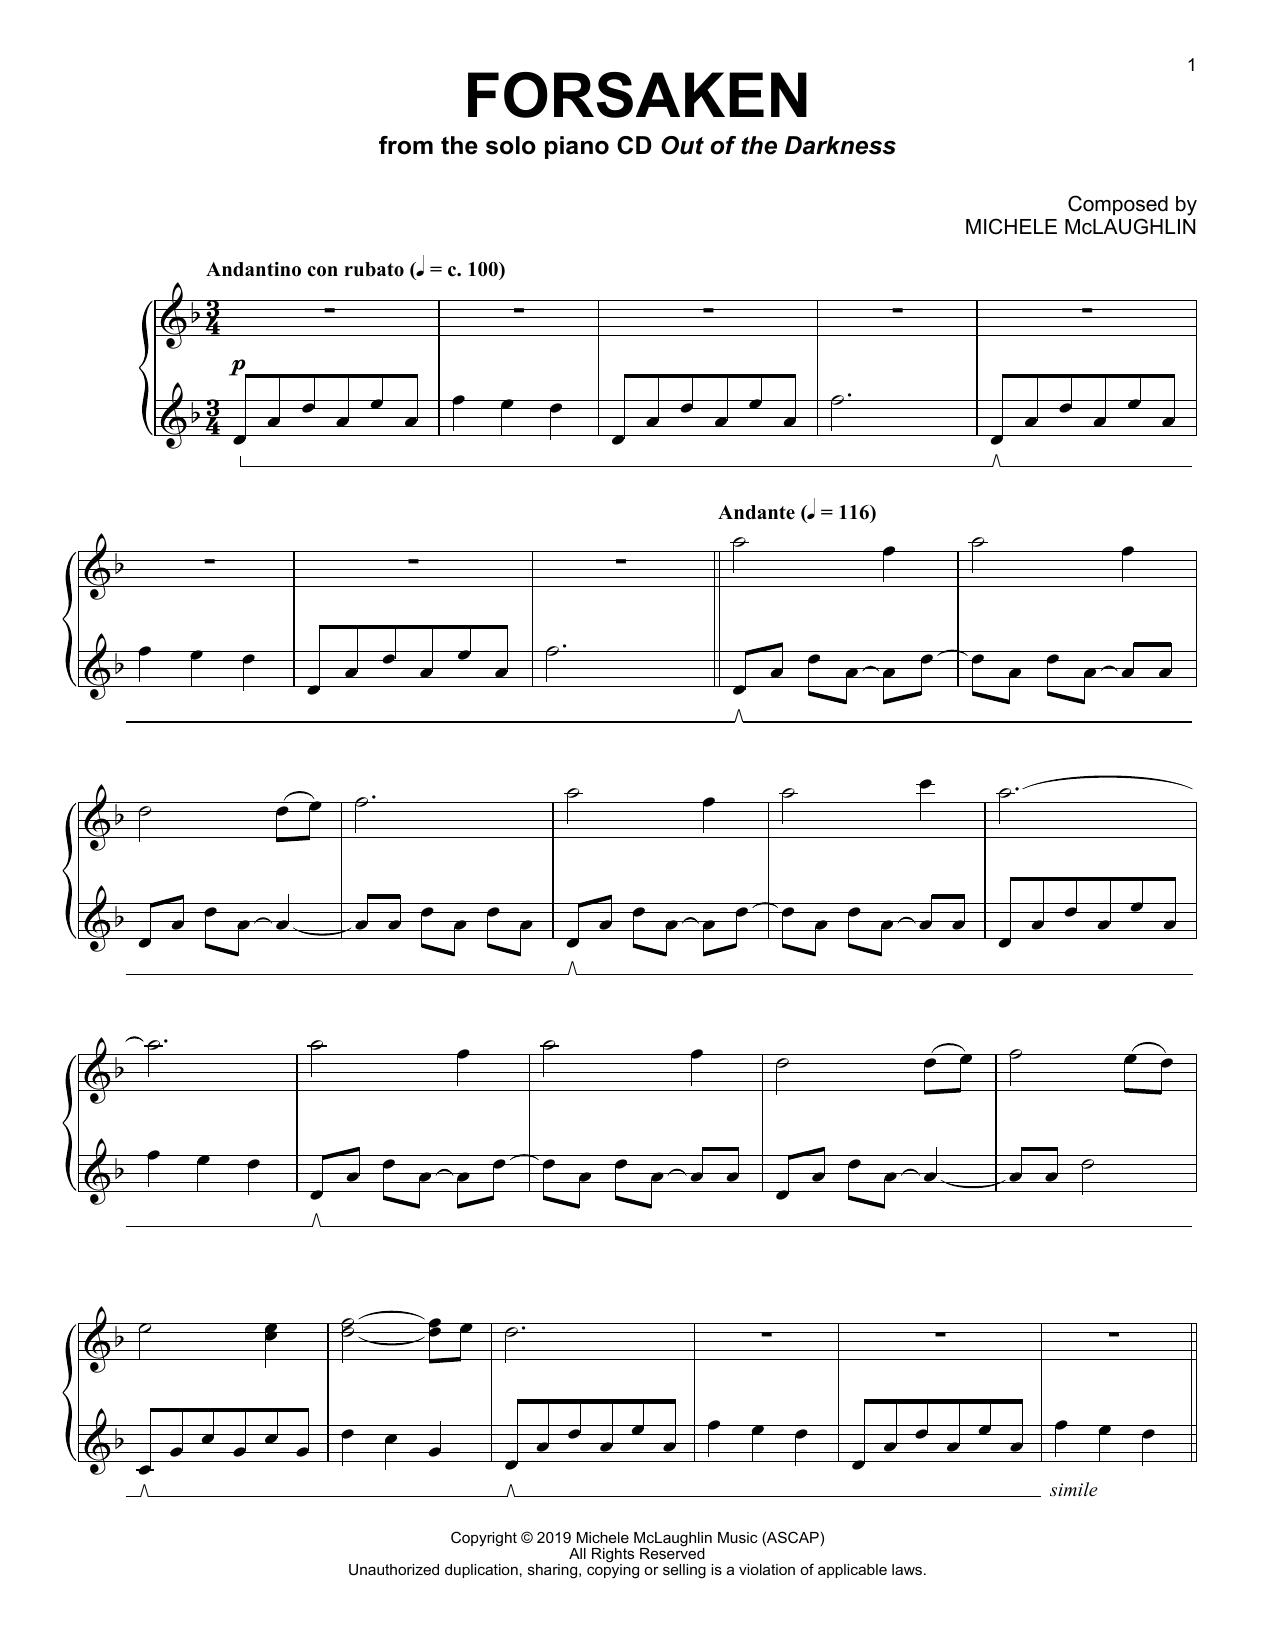 Michele McLaughlin Forsaken sheet music notes and chords